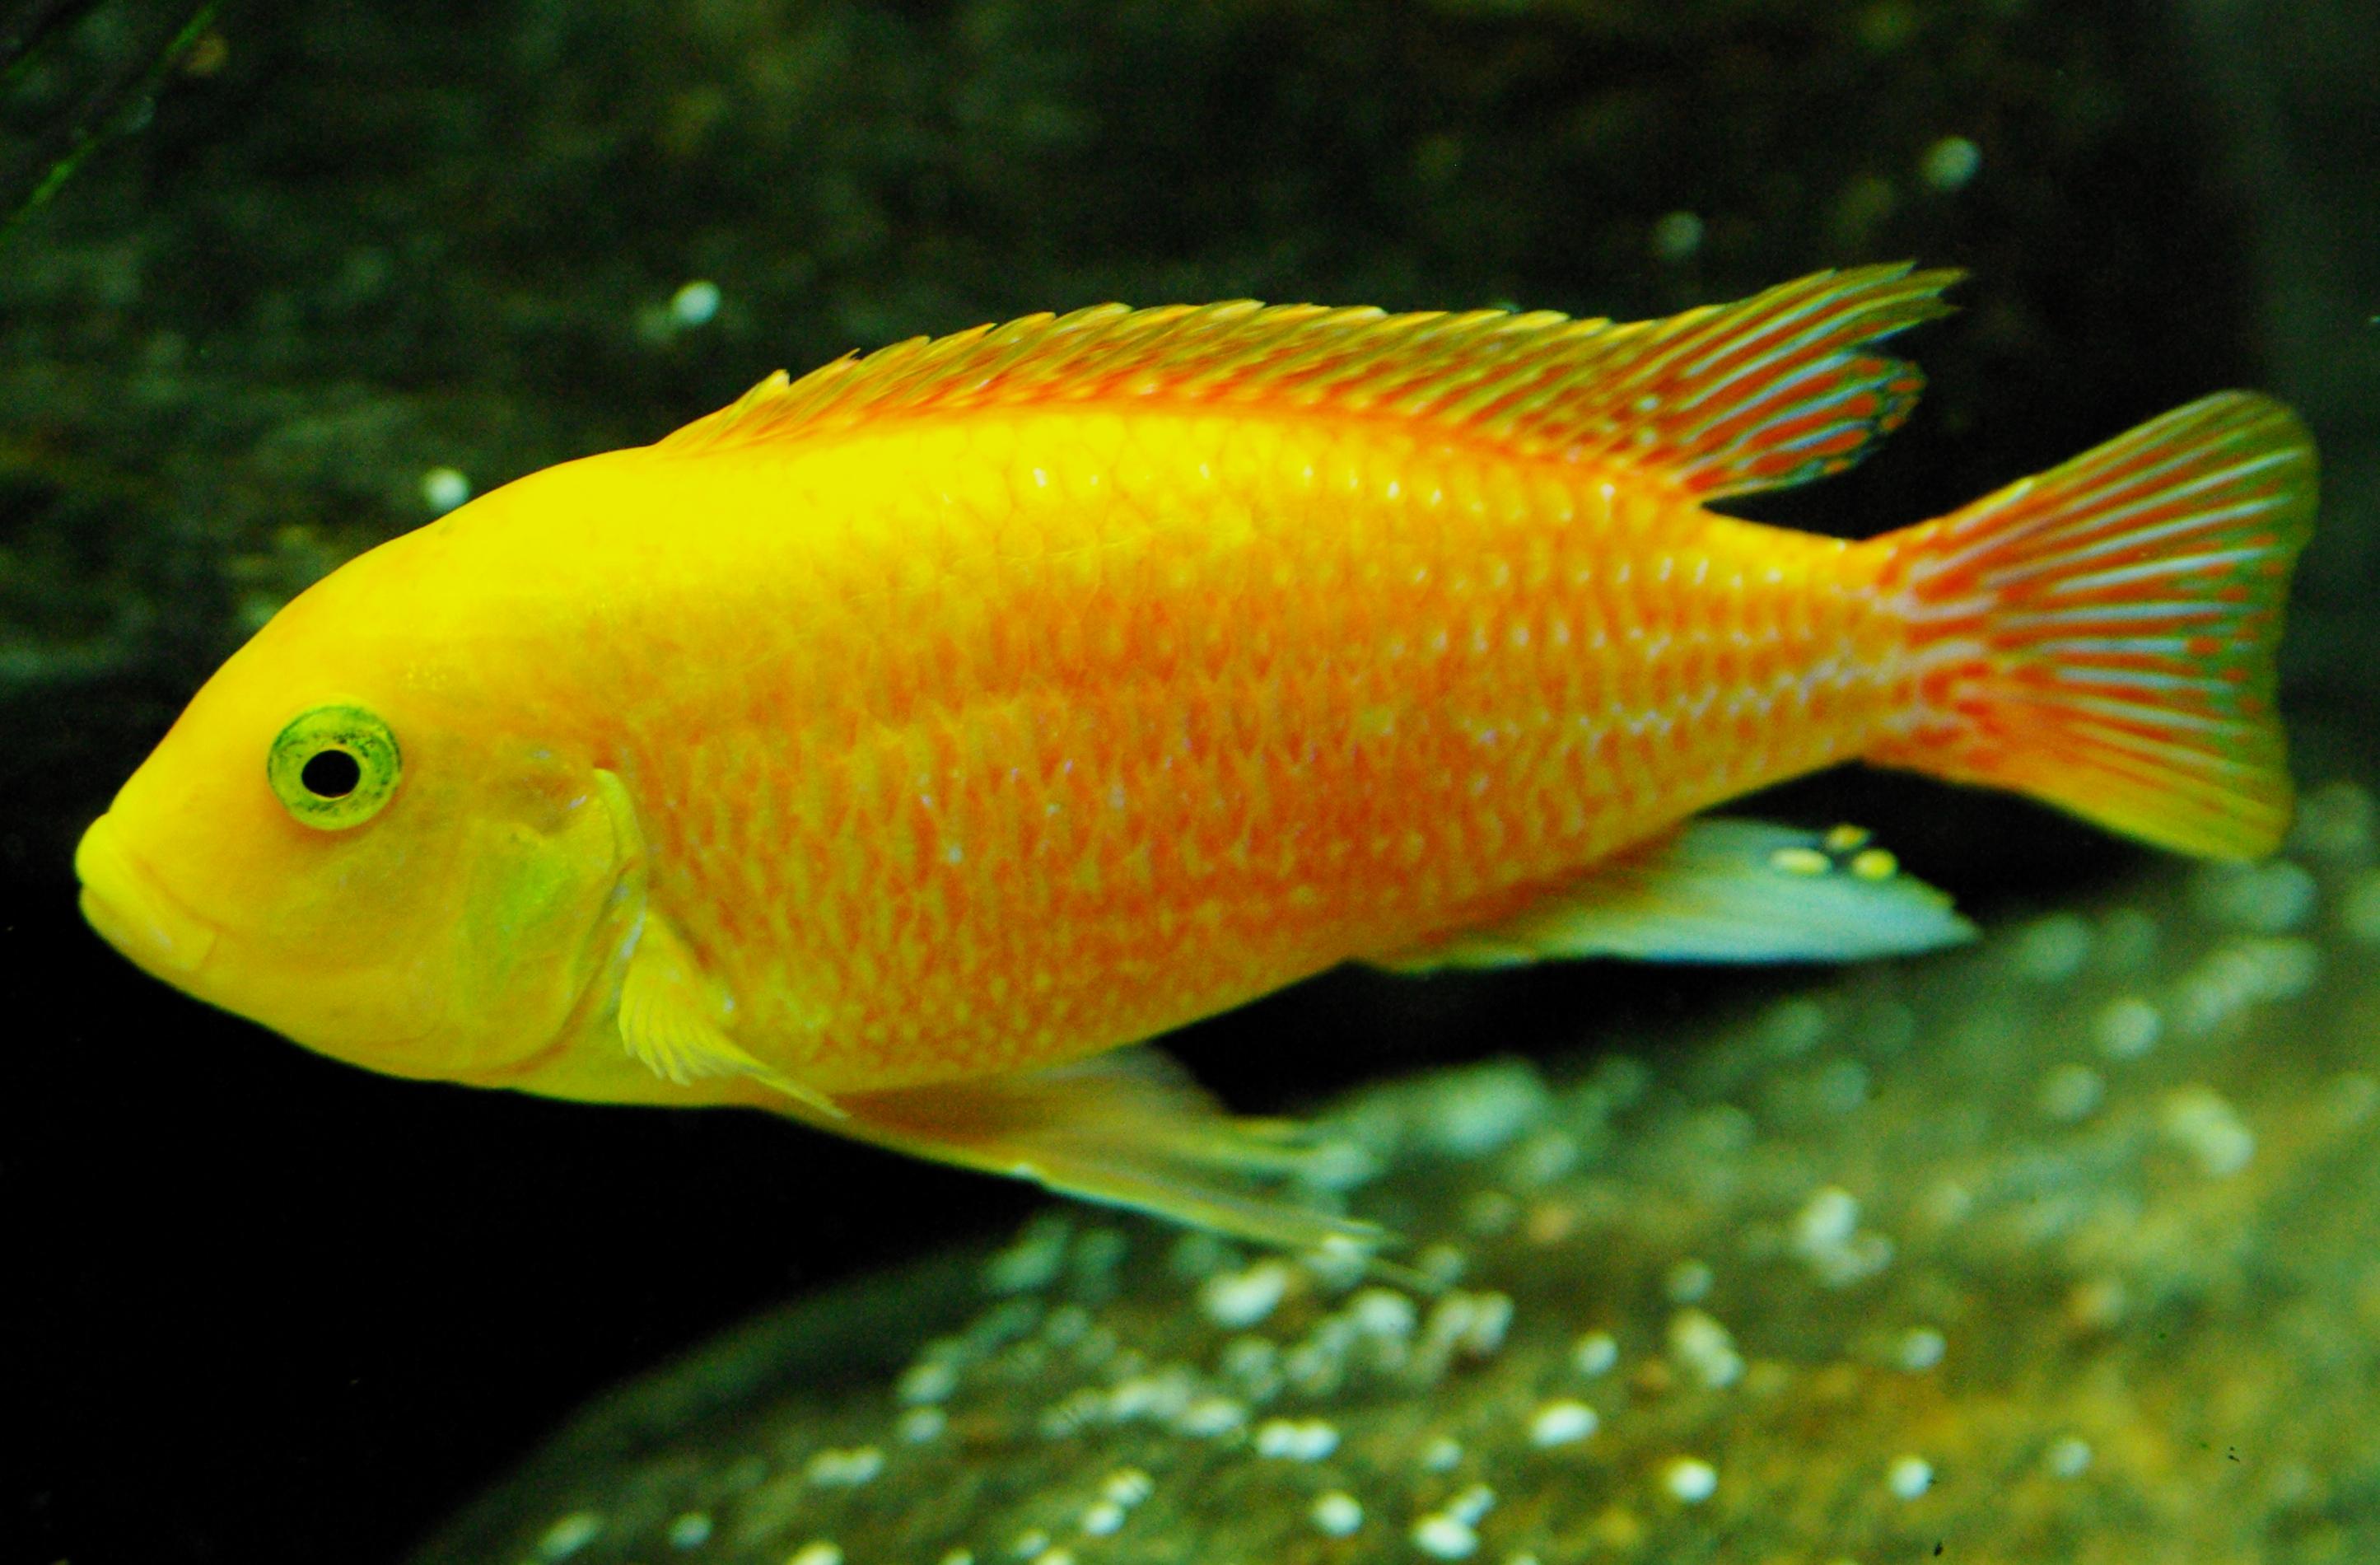 yellow cichlid fish - photo #39